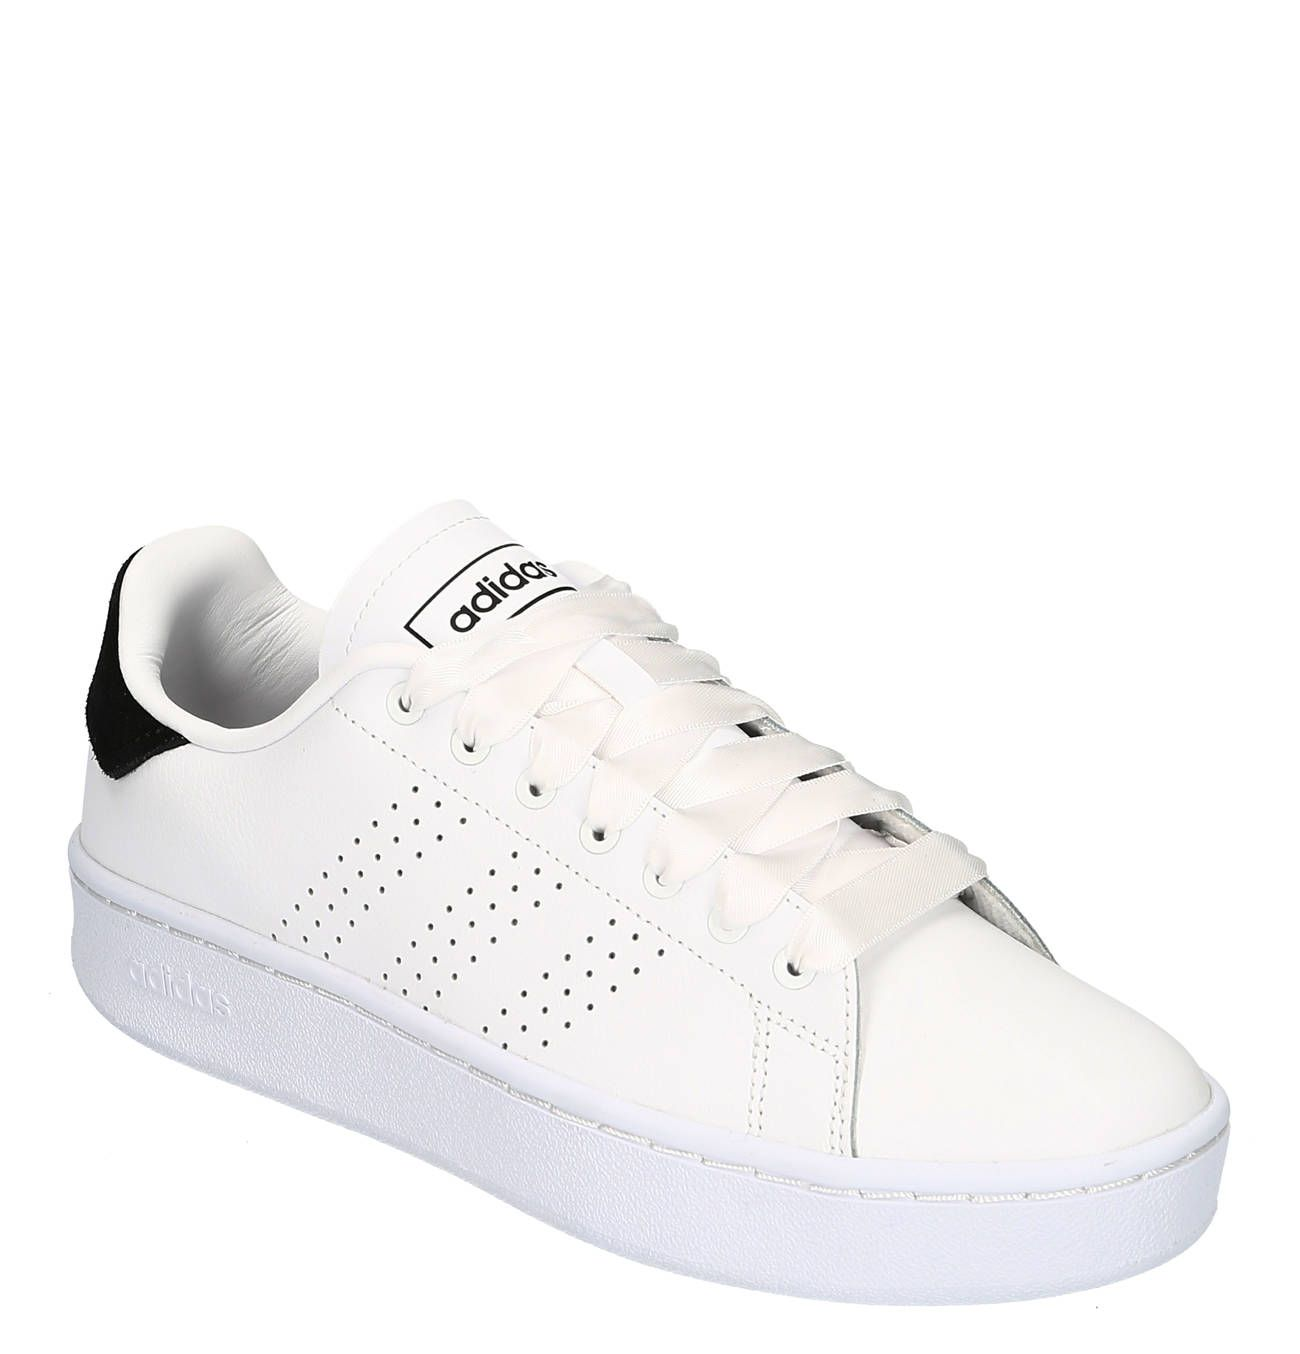 Sneaker Advantage Bold Leder Kontrast Detail Breite Schnursenkel Sneaker Adidas Sneaker Damenschuhe Sneaker